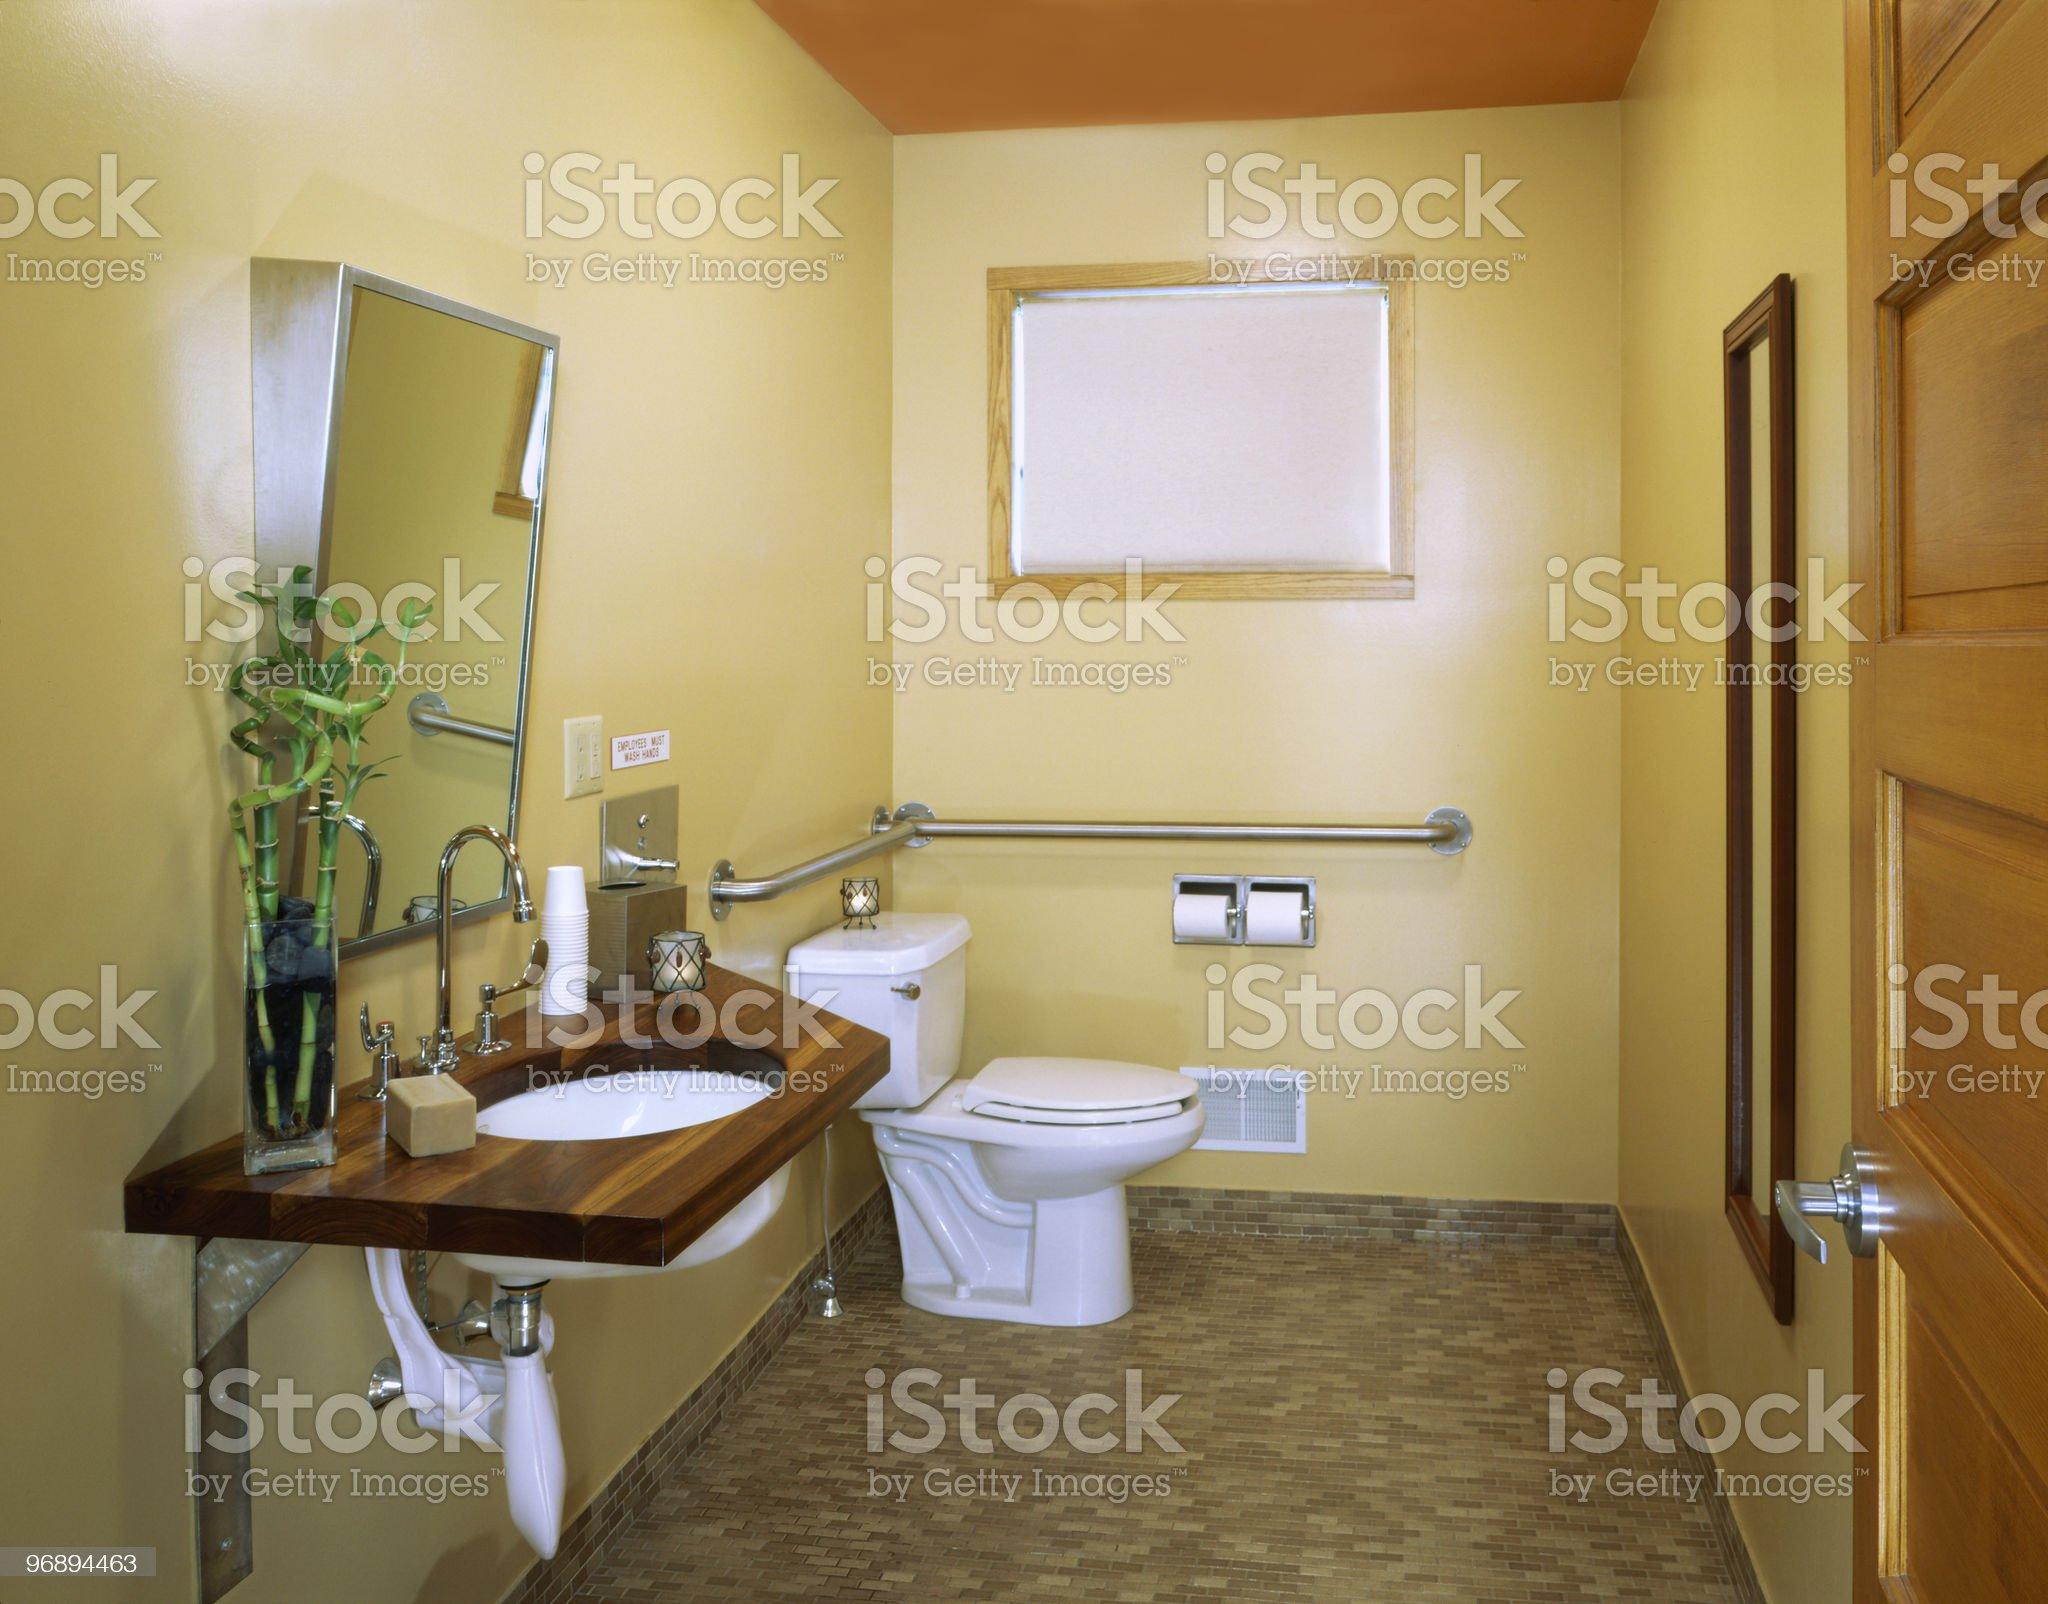 Handicap Access Restroom royalty-free stock photo